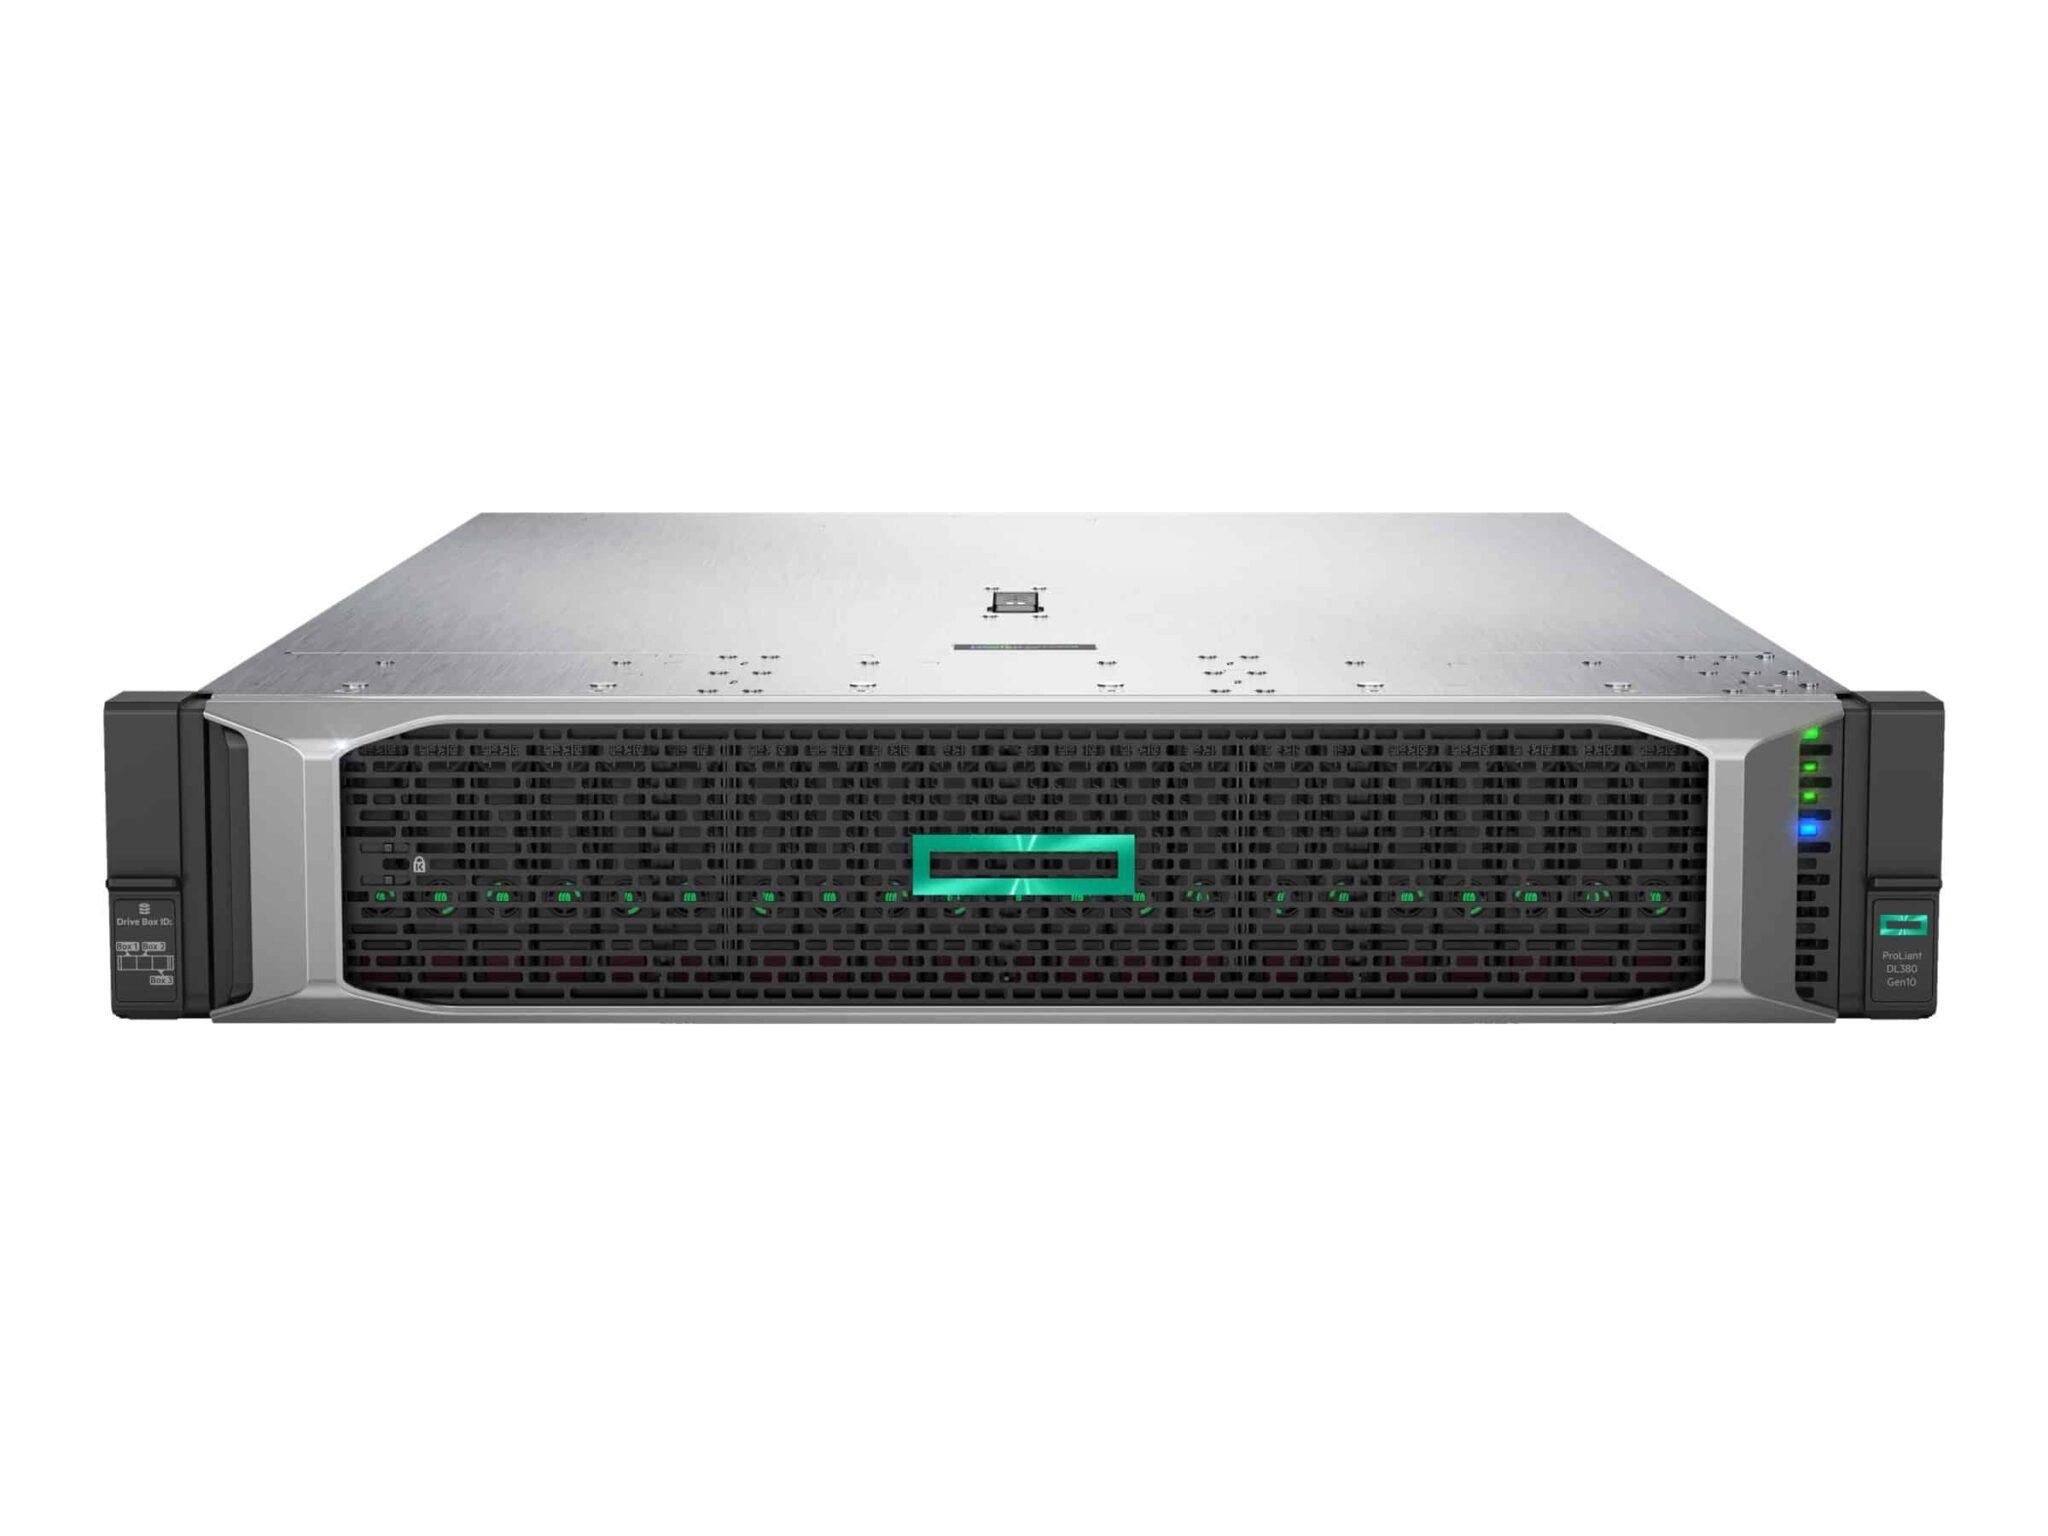 HPE ProLiant DL380 2U Rack-mount Perf Server – 1P Xeon Silver 4114 – RAM 32 GB